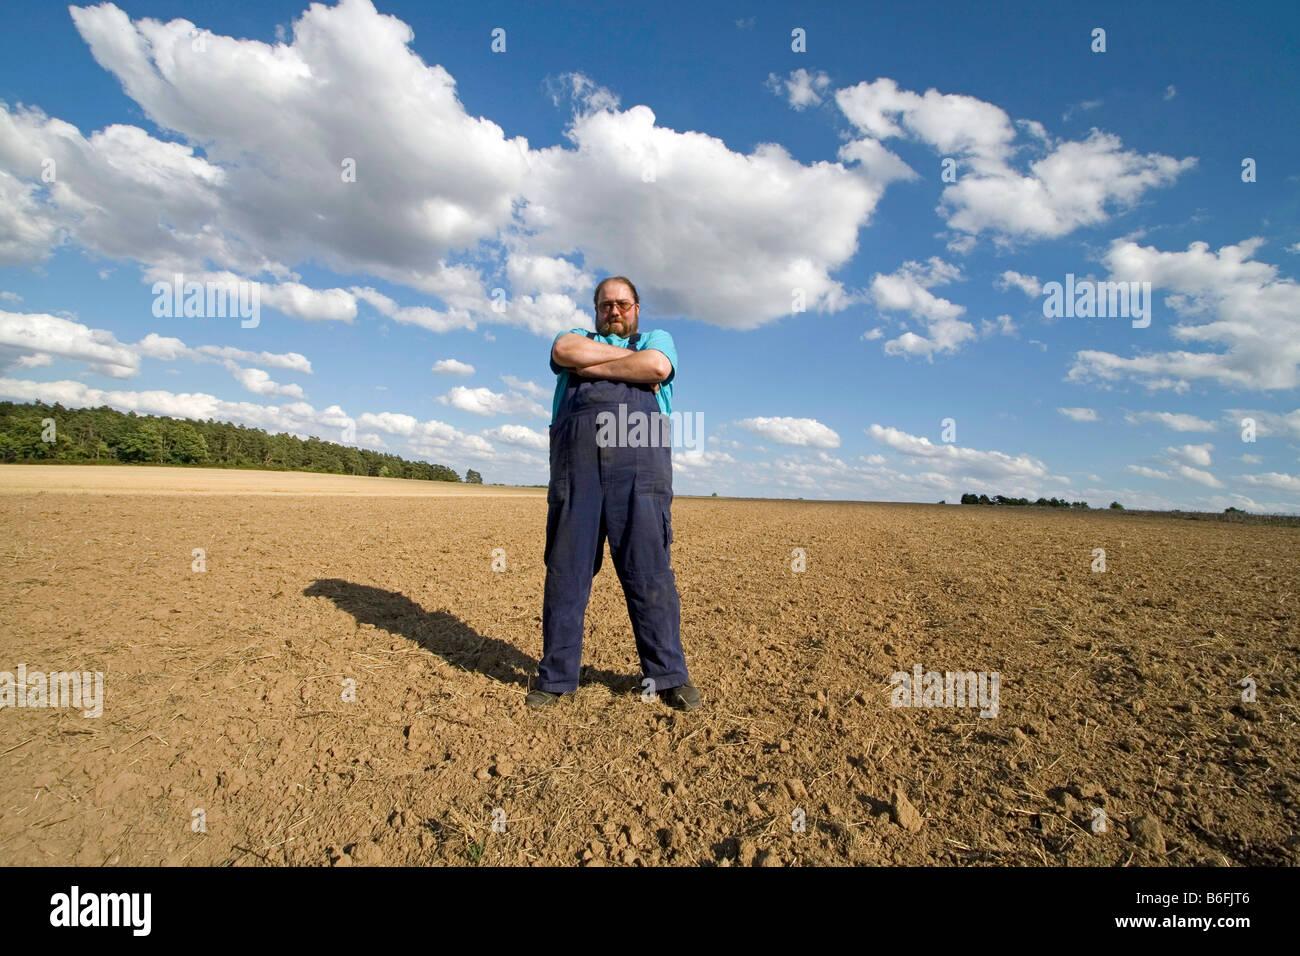 Farmer standing in a field - Stock Image